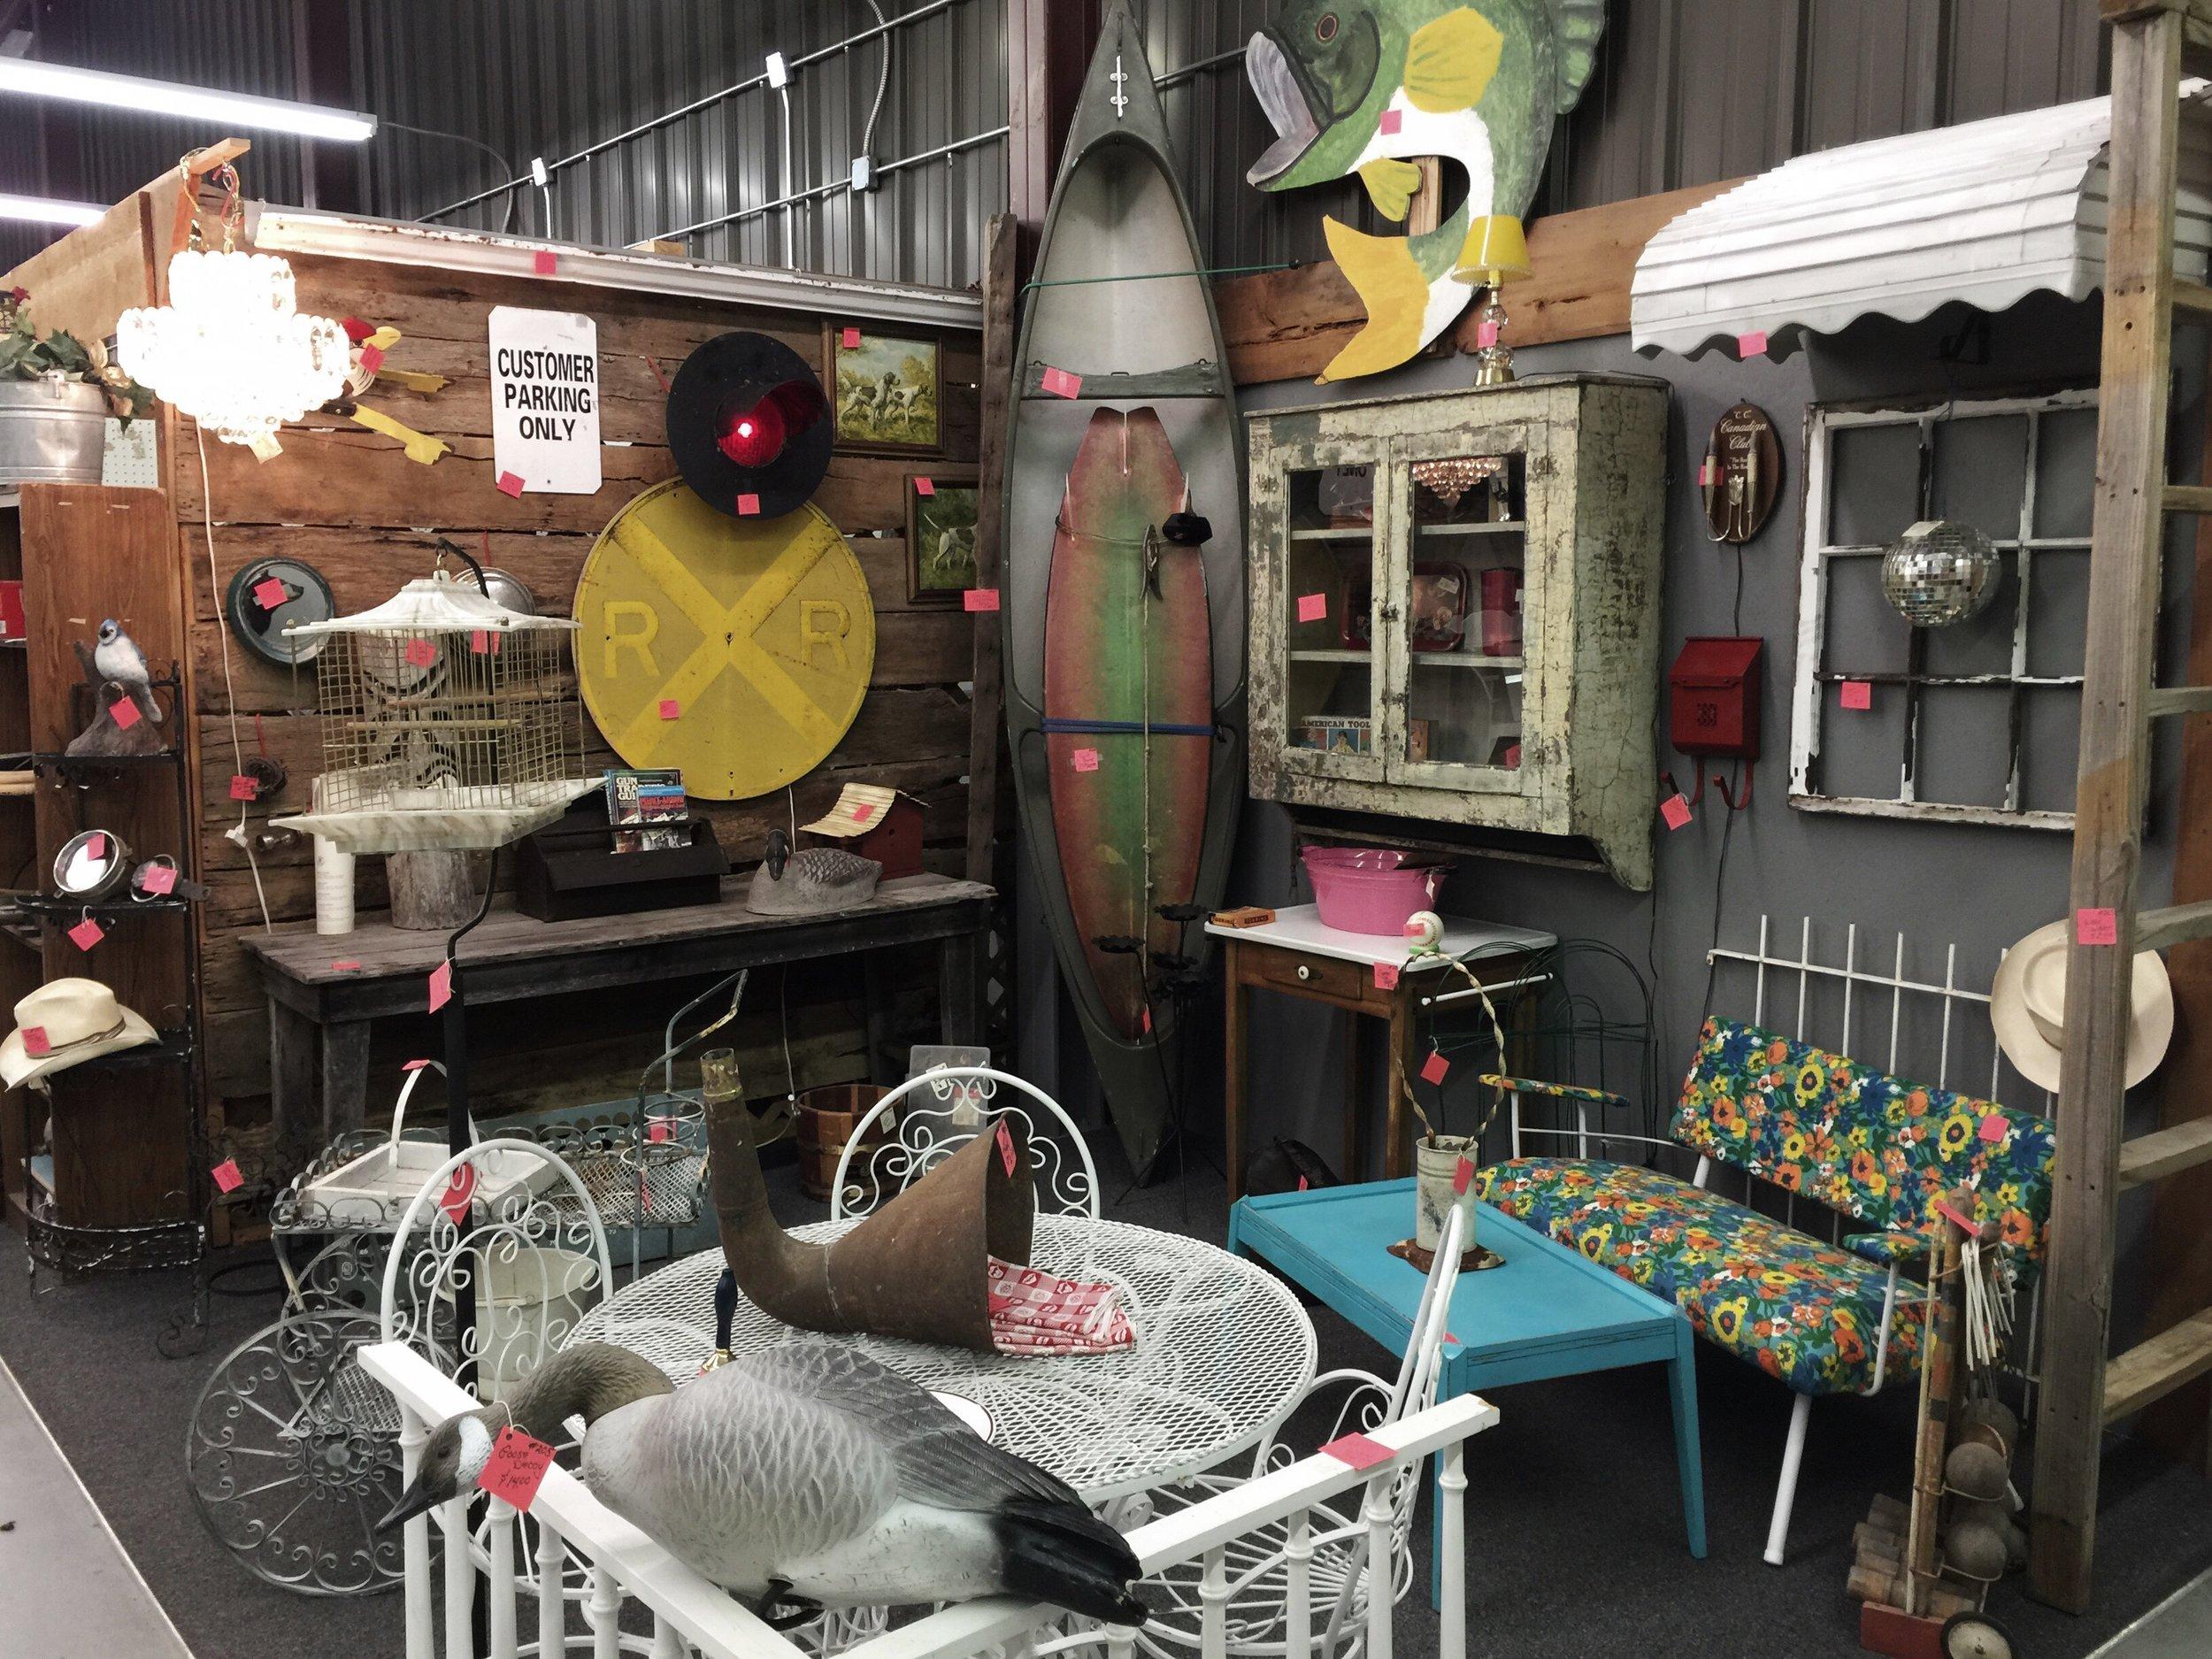 Camp-Flea-Antique-Mall-Vendor-Booths